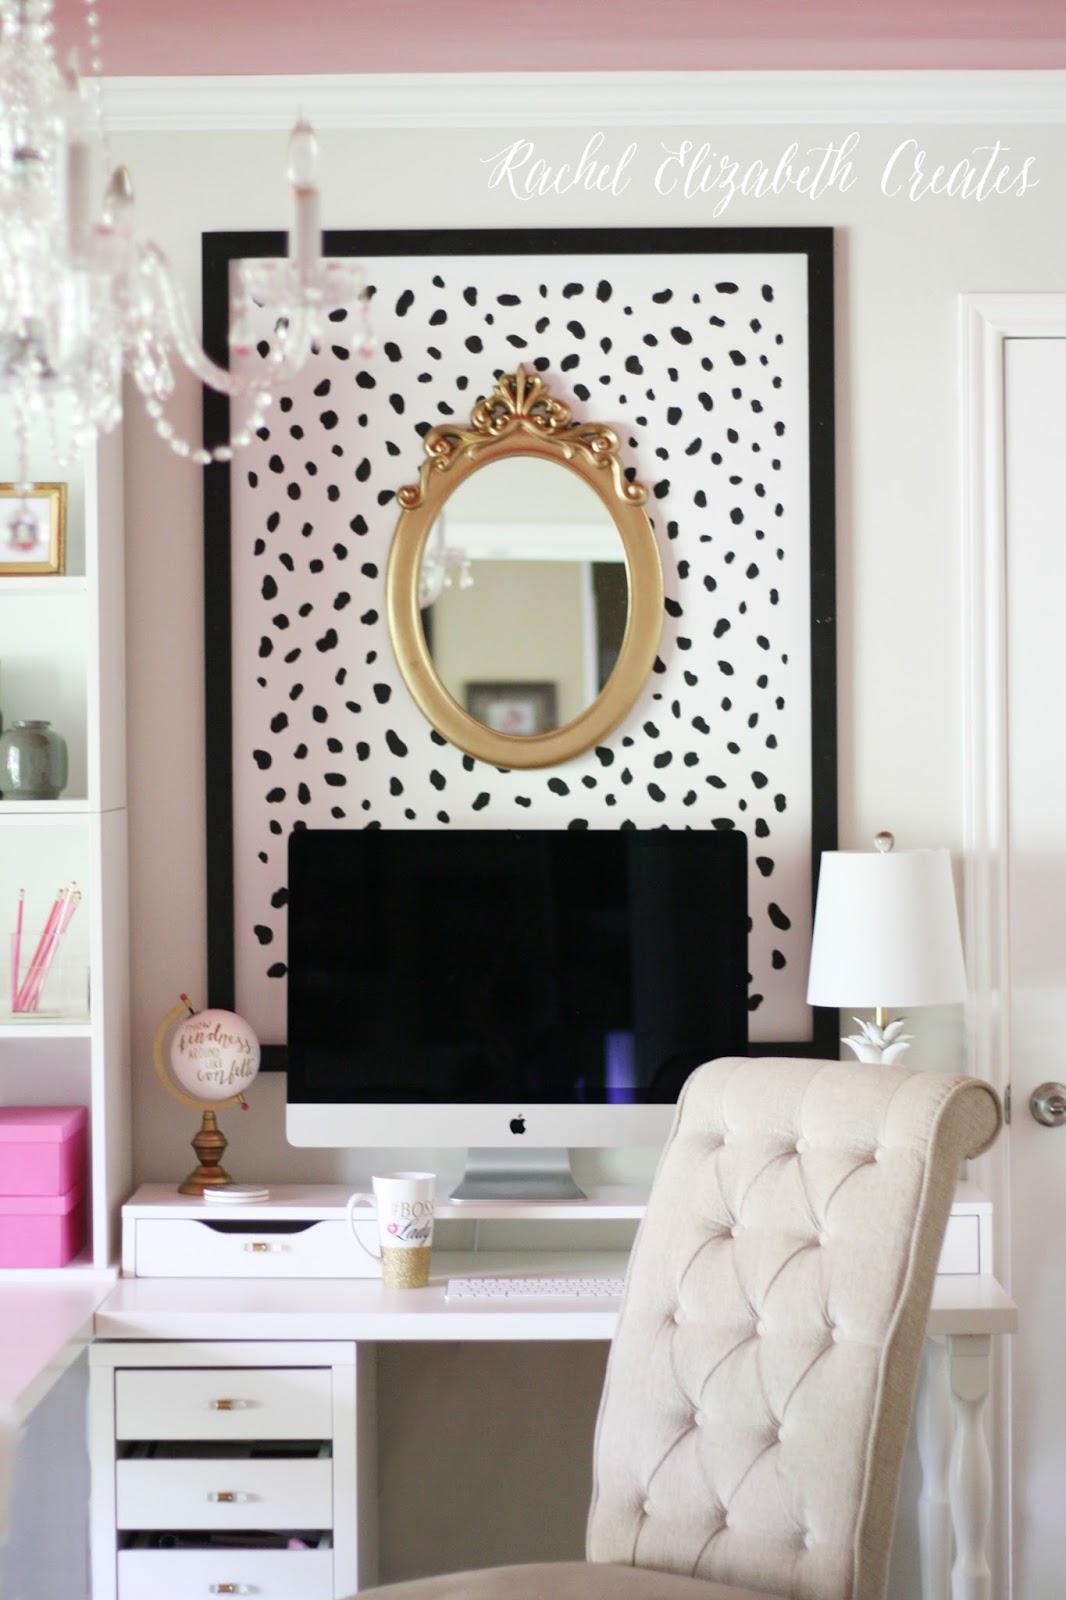 Bliss Magazine Office Design Install | Rachel Elizabeth Creates